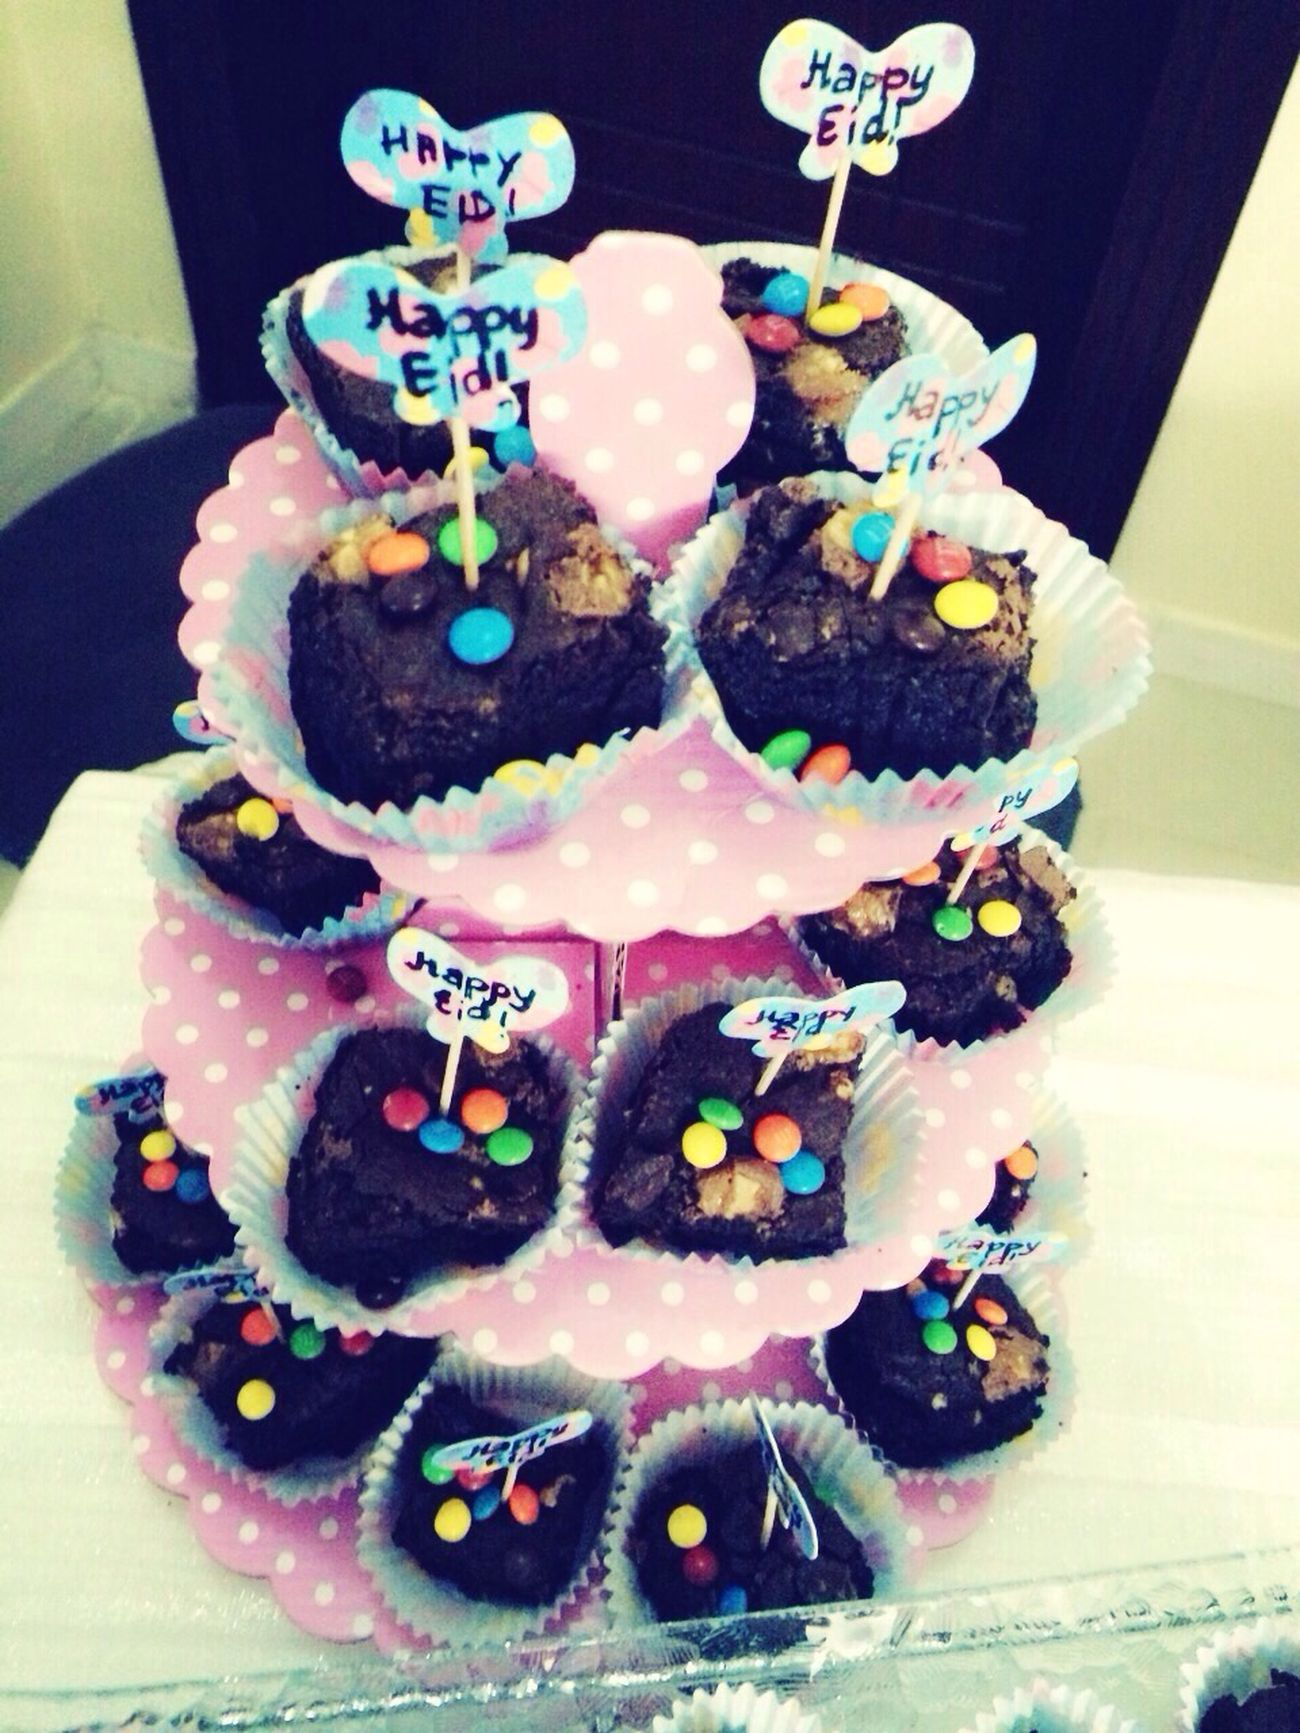 HappyEid Eid Mubarak Happy Eidul Adha Brownies